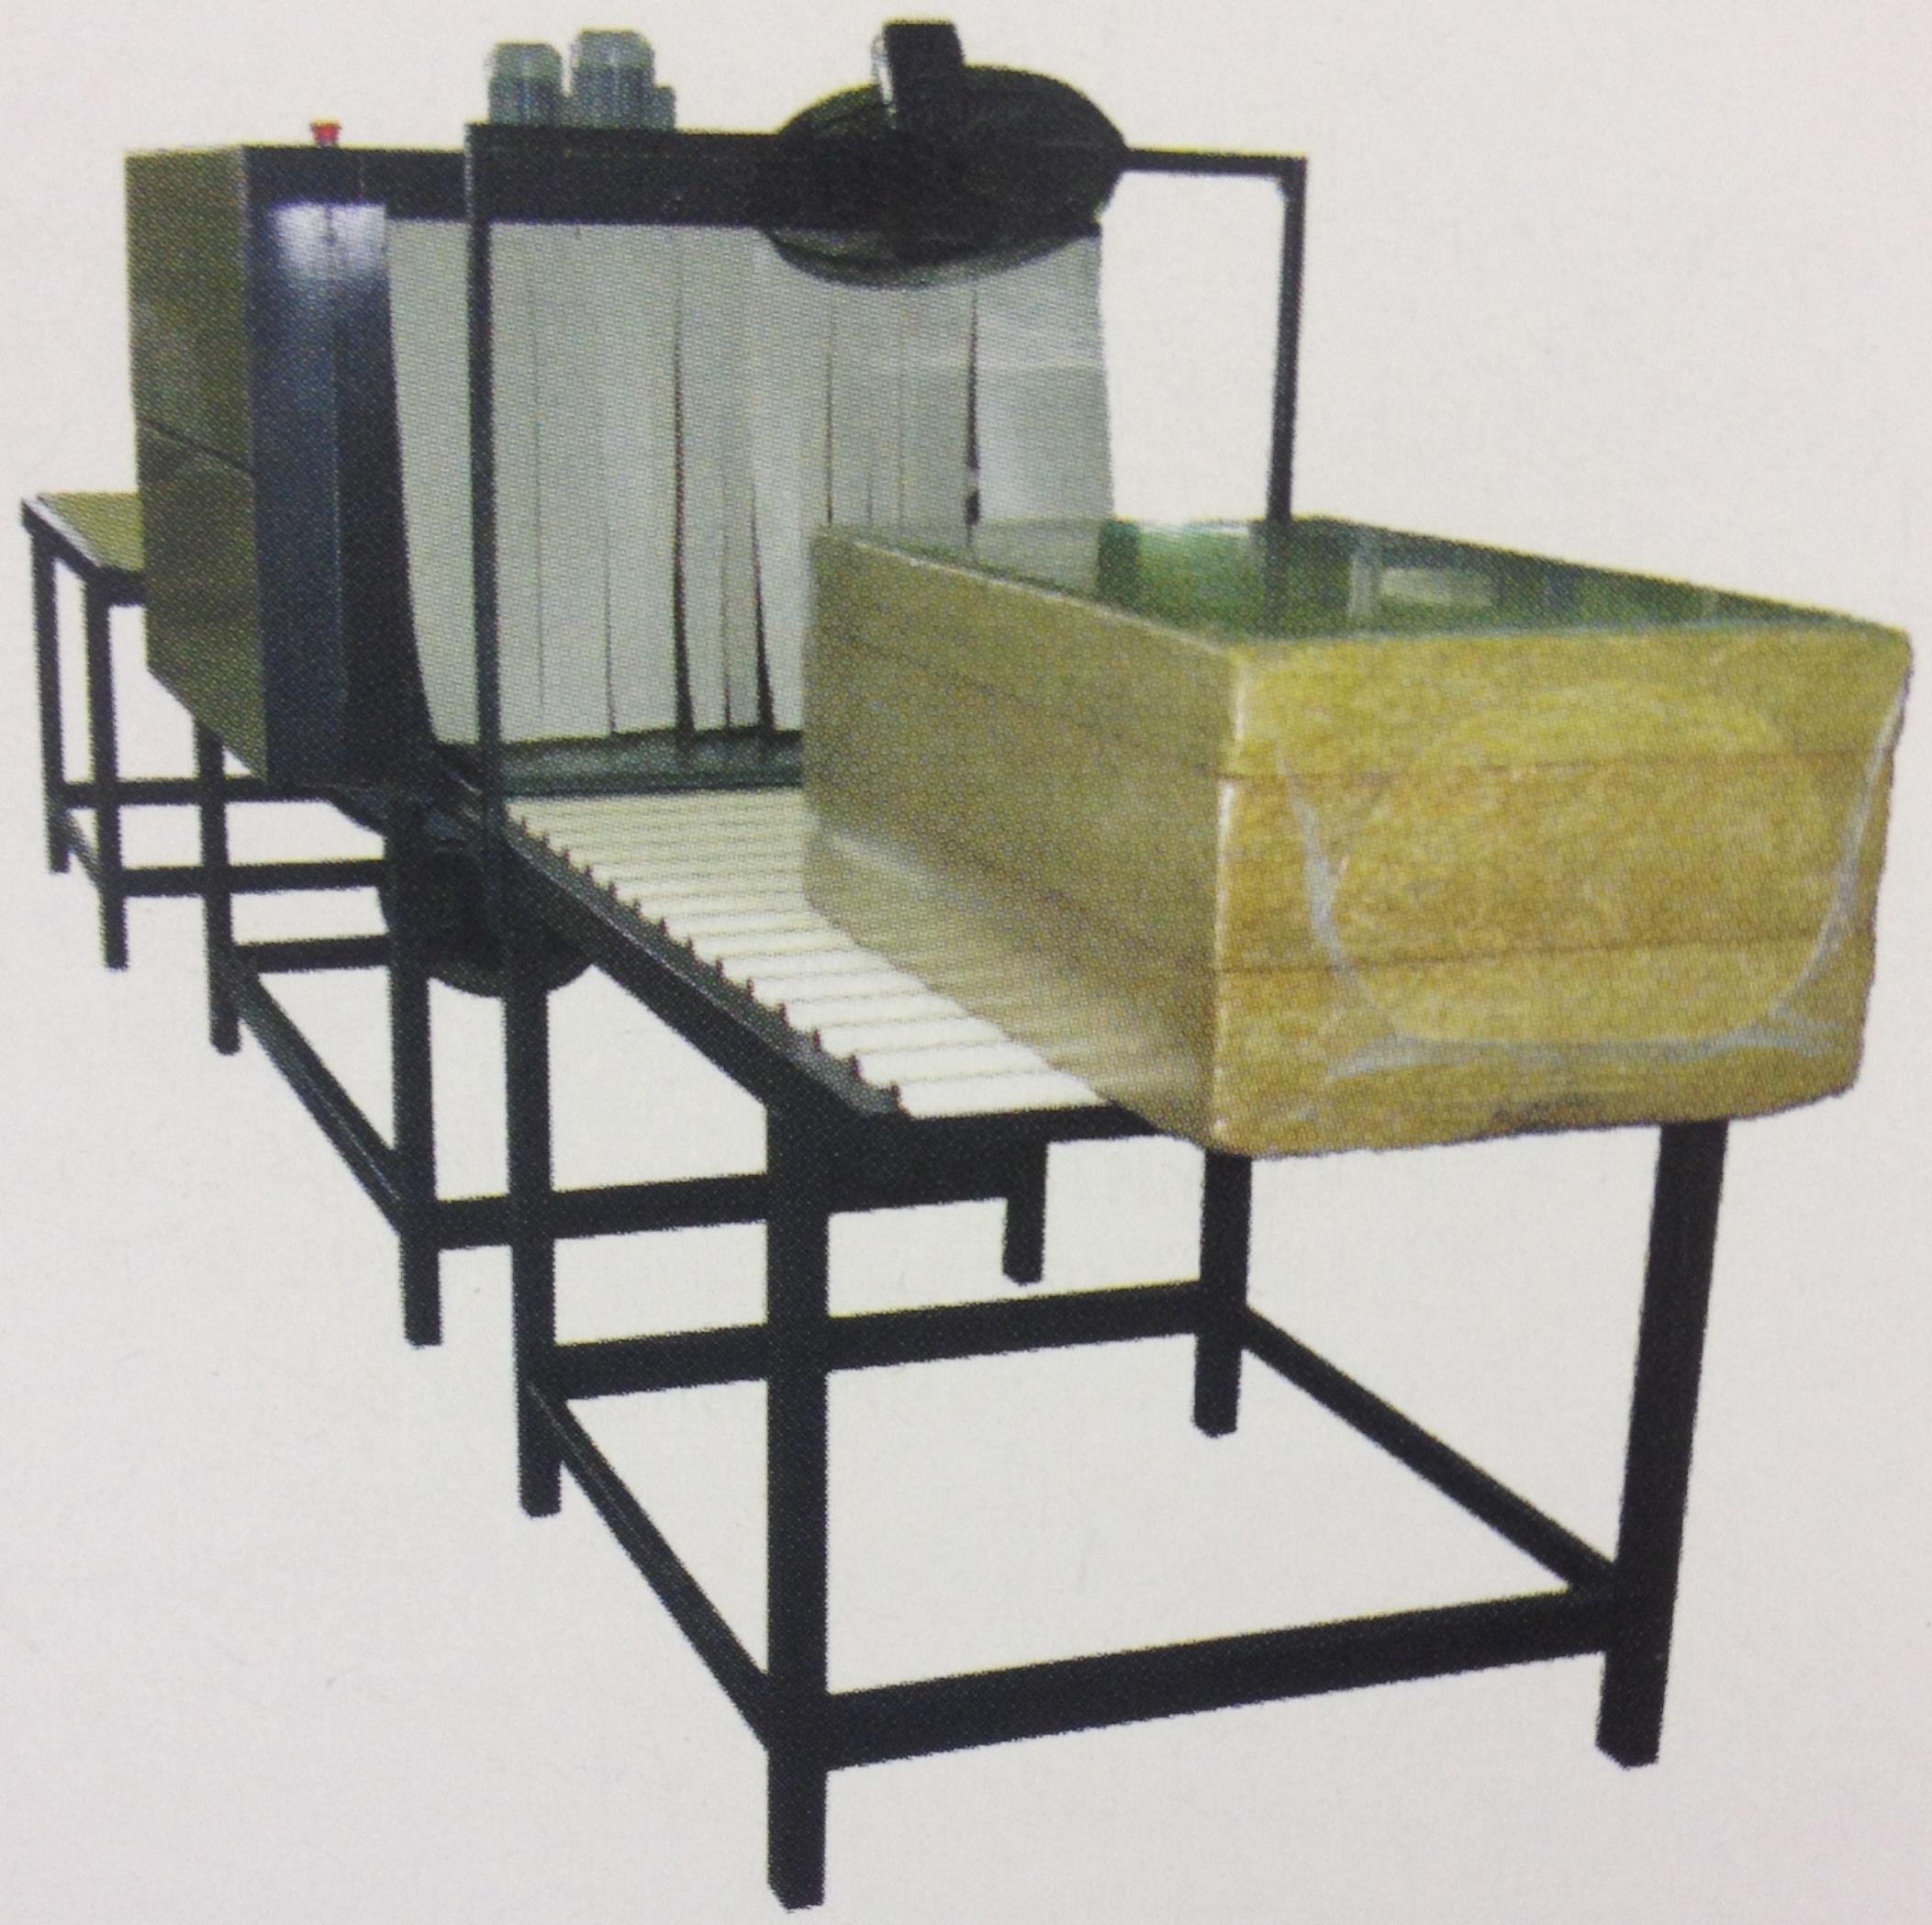 Упаковочная машина МТУ Стимул 127-226-4